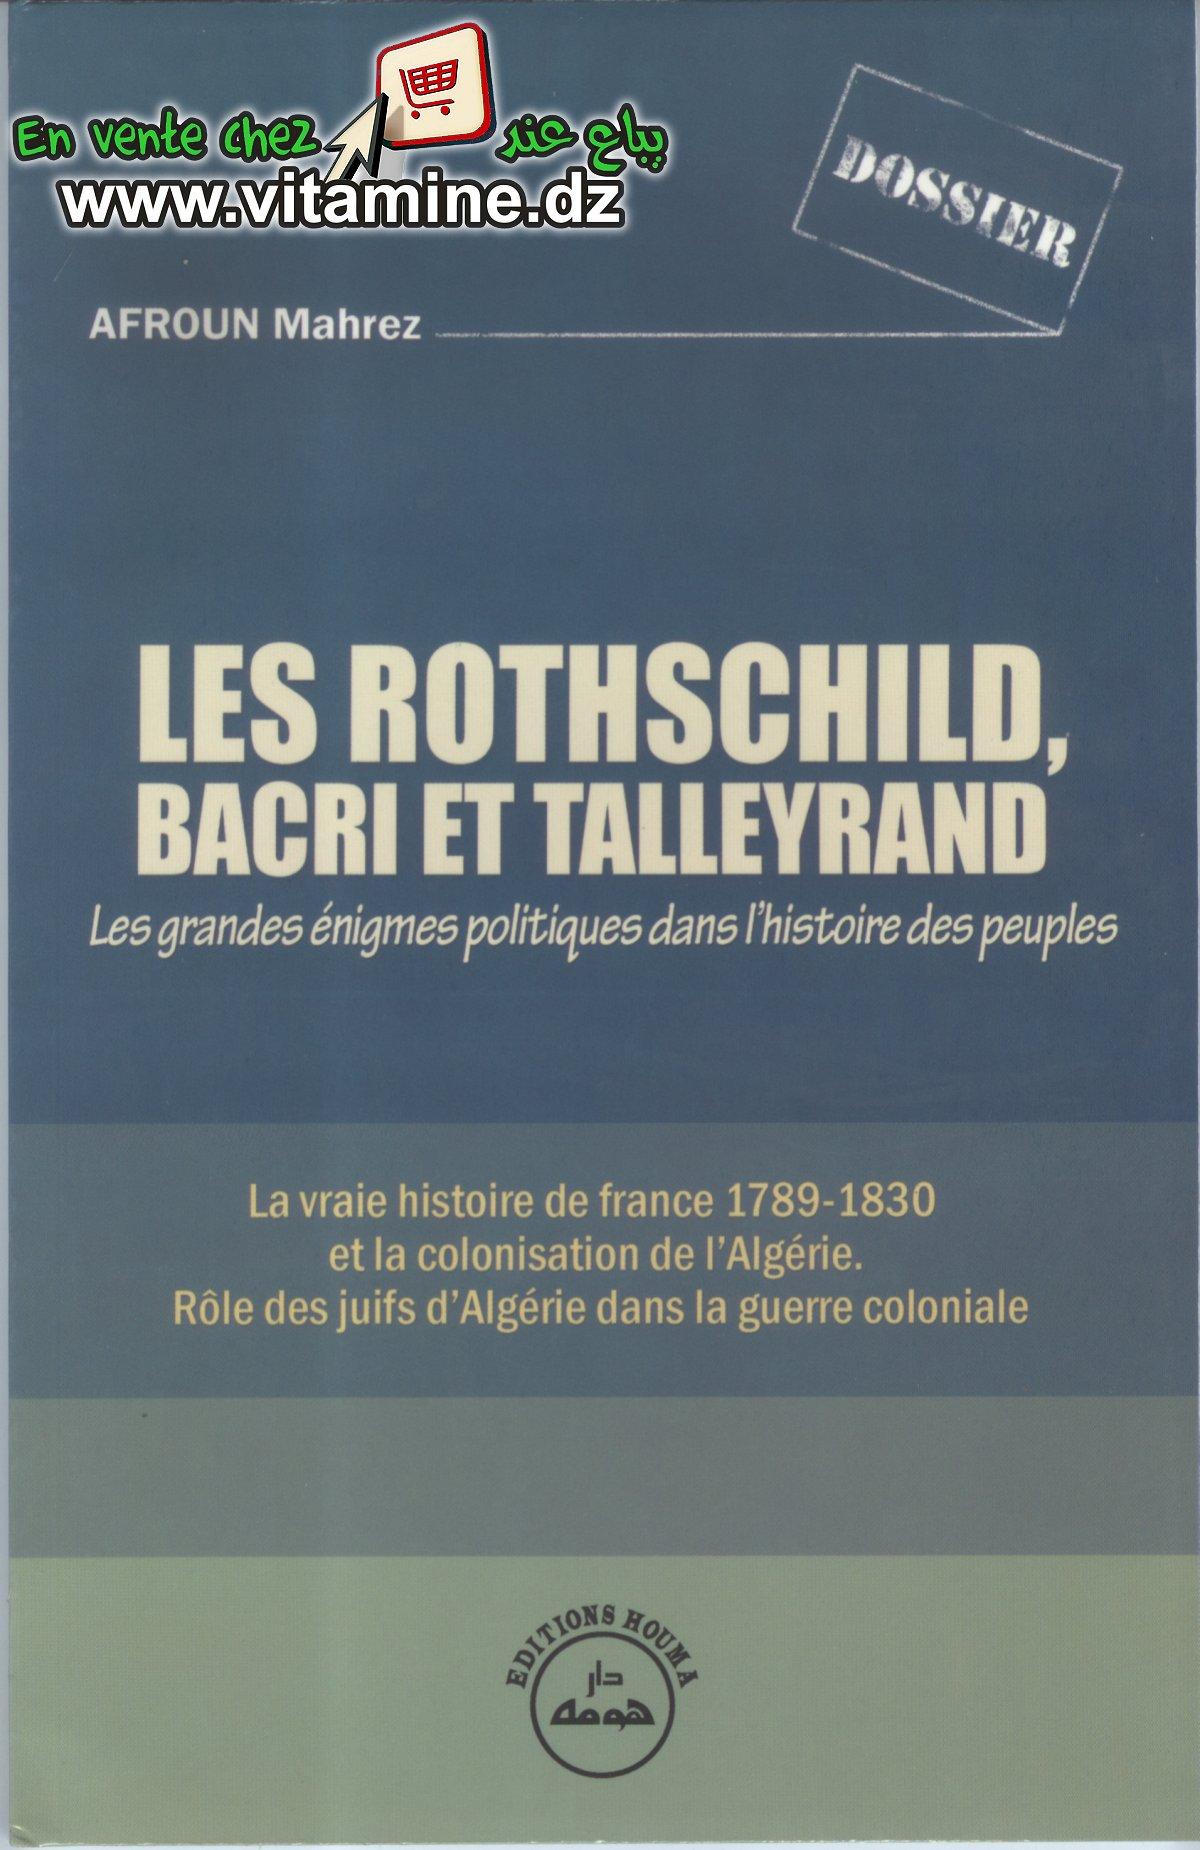 Afroun Mahrez - Les Rothschild, Bacri et Talleyrand